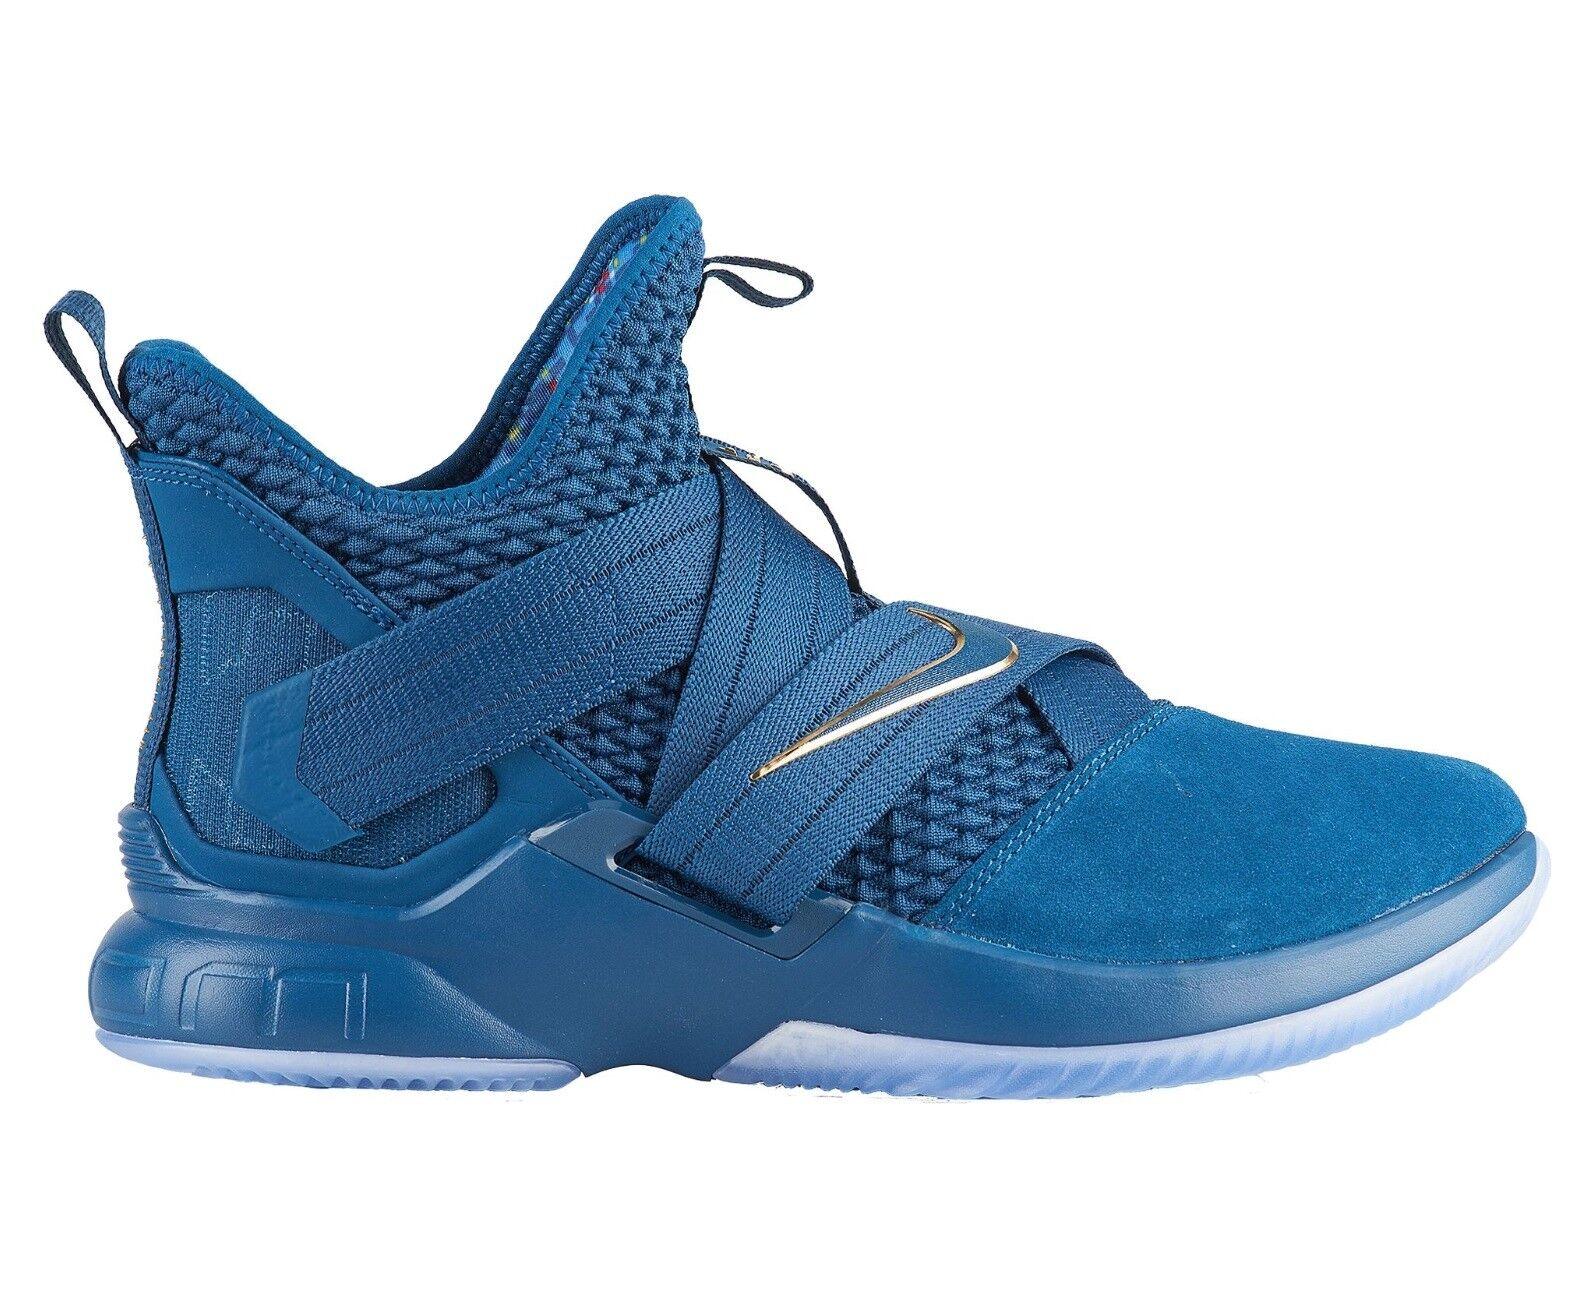 Nike lebron soldato xii sfg agimat Uomo ao4054-400 blu egeo scorpe 8